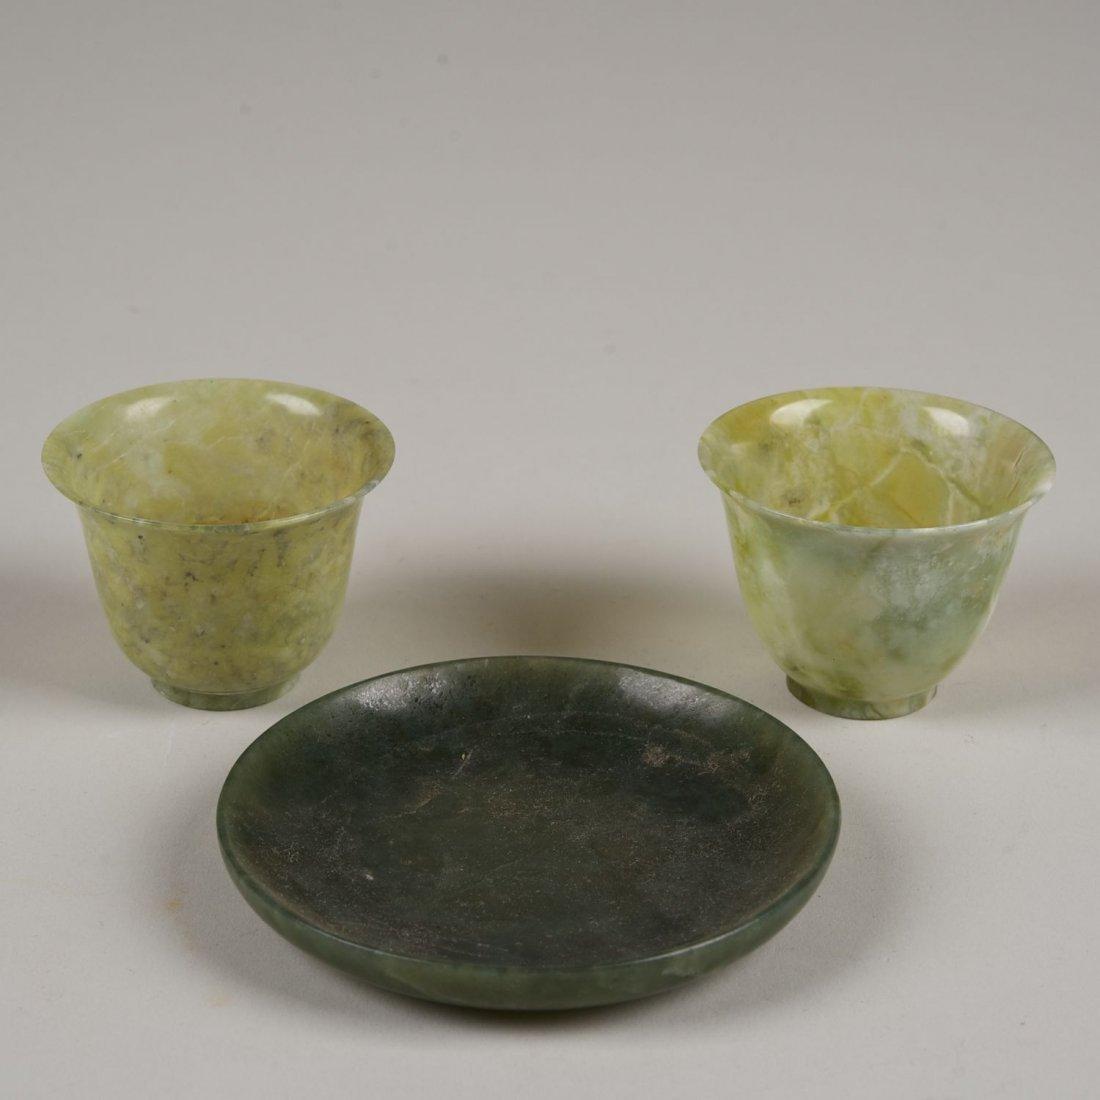 (3) pcs. Chinese green jade table items